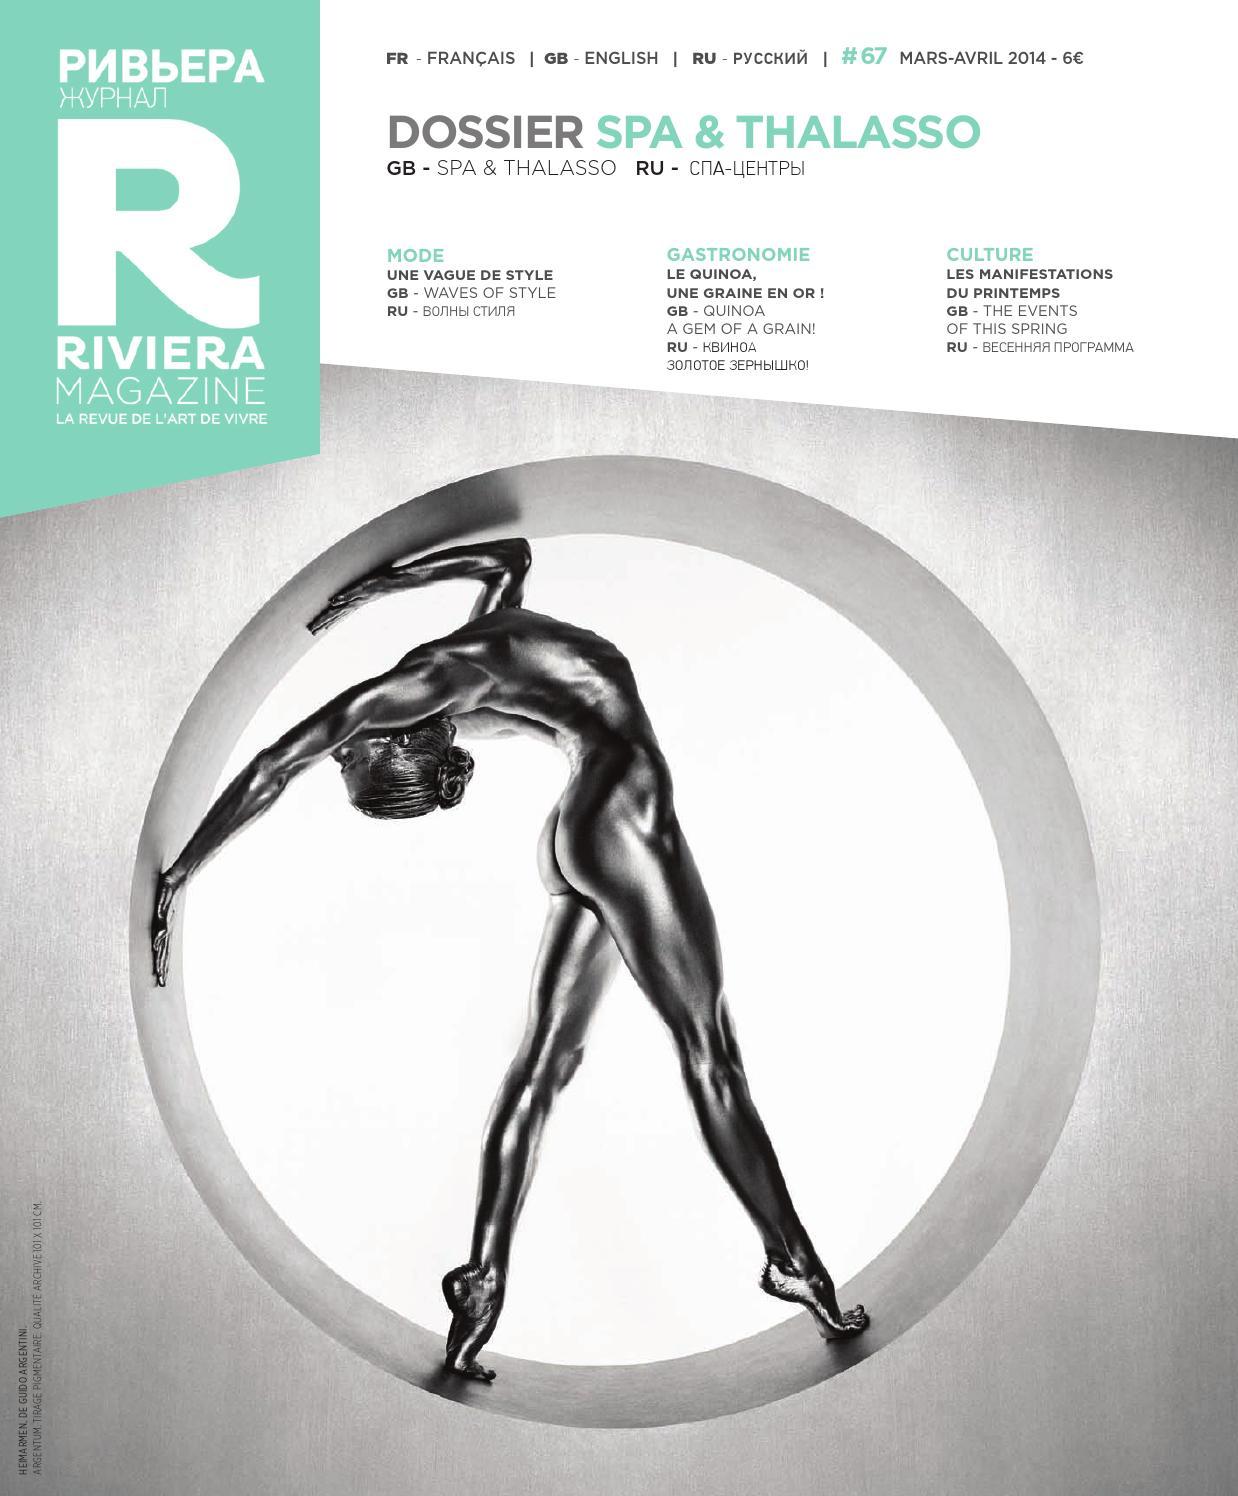 Riviera Magazine n°67 - Mars-avril 2014 by Riviera Magazine - issuu 47f12ebafebe